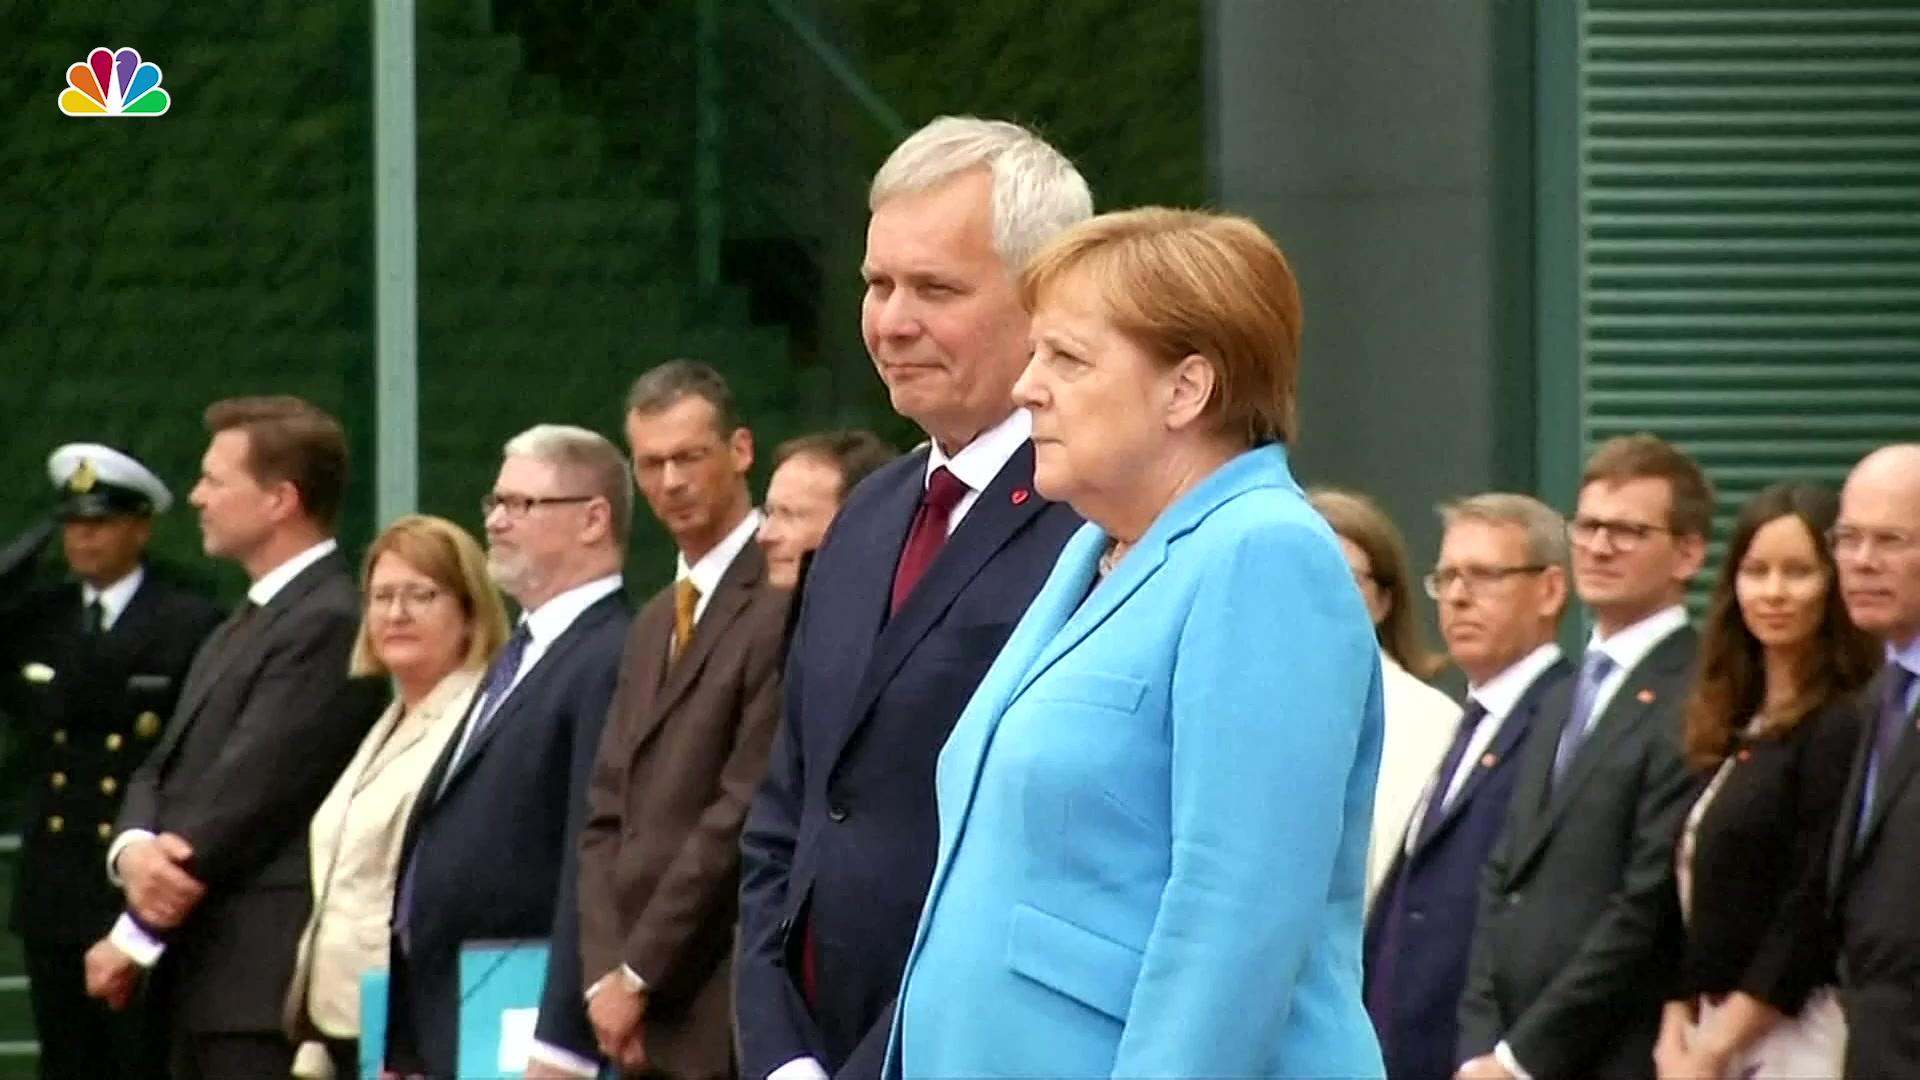 Angela Merkel Topless angela merkel seen shaking for 3rd time – nbc 6 south florida